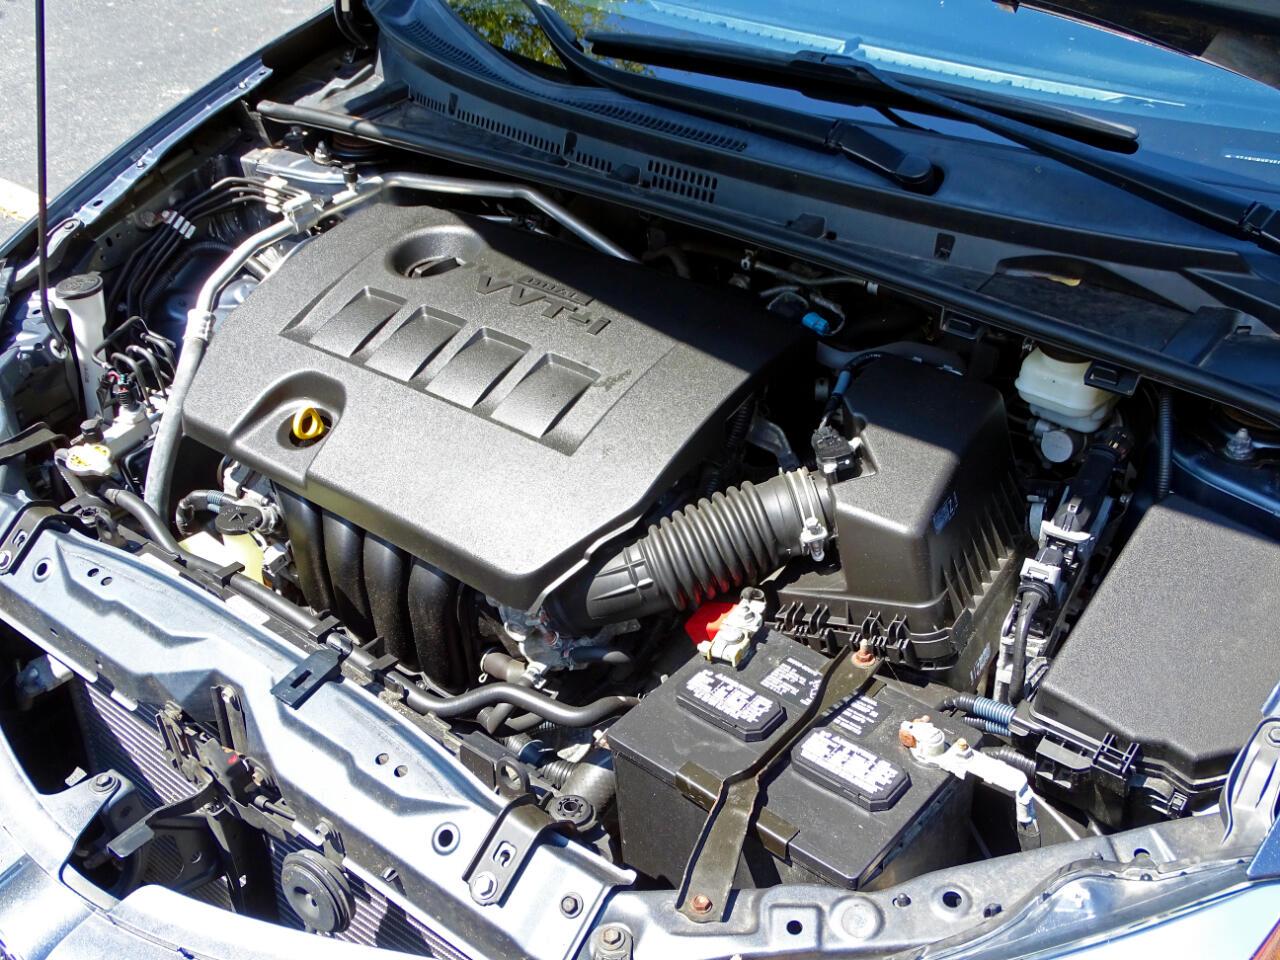 2015 Toyota Corolla 4dr Sdn CVT LE (Natl)